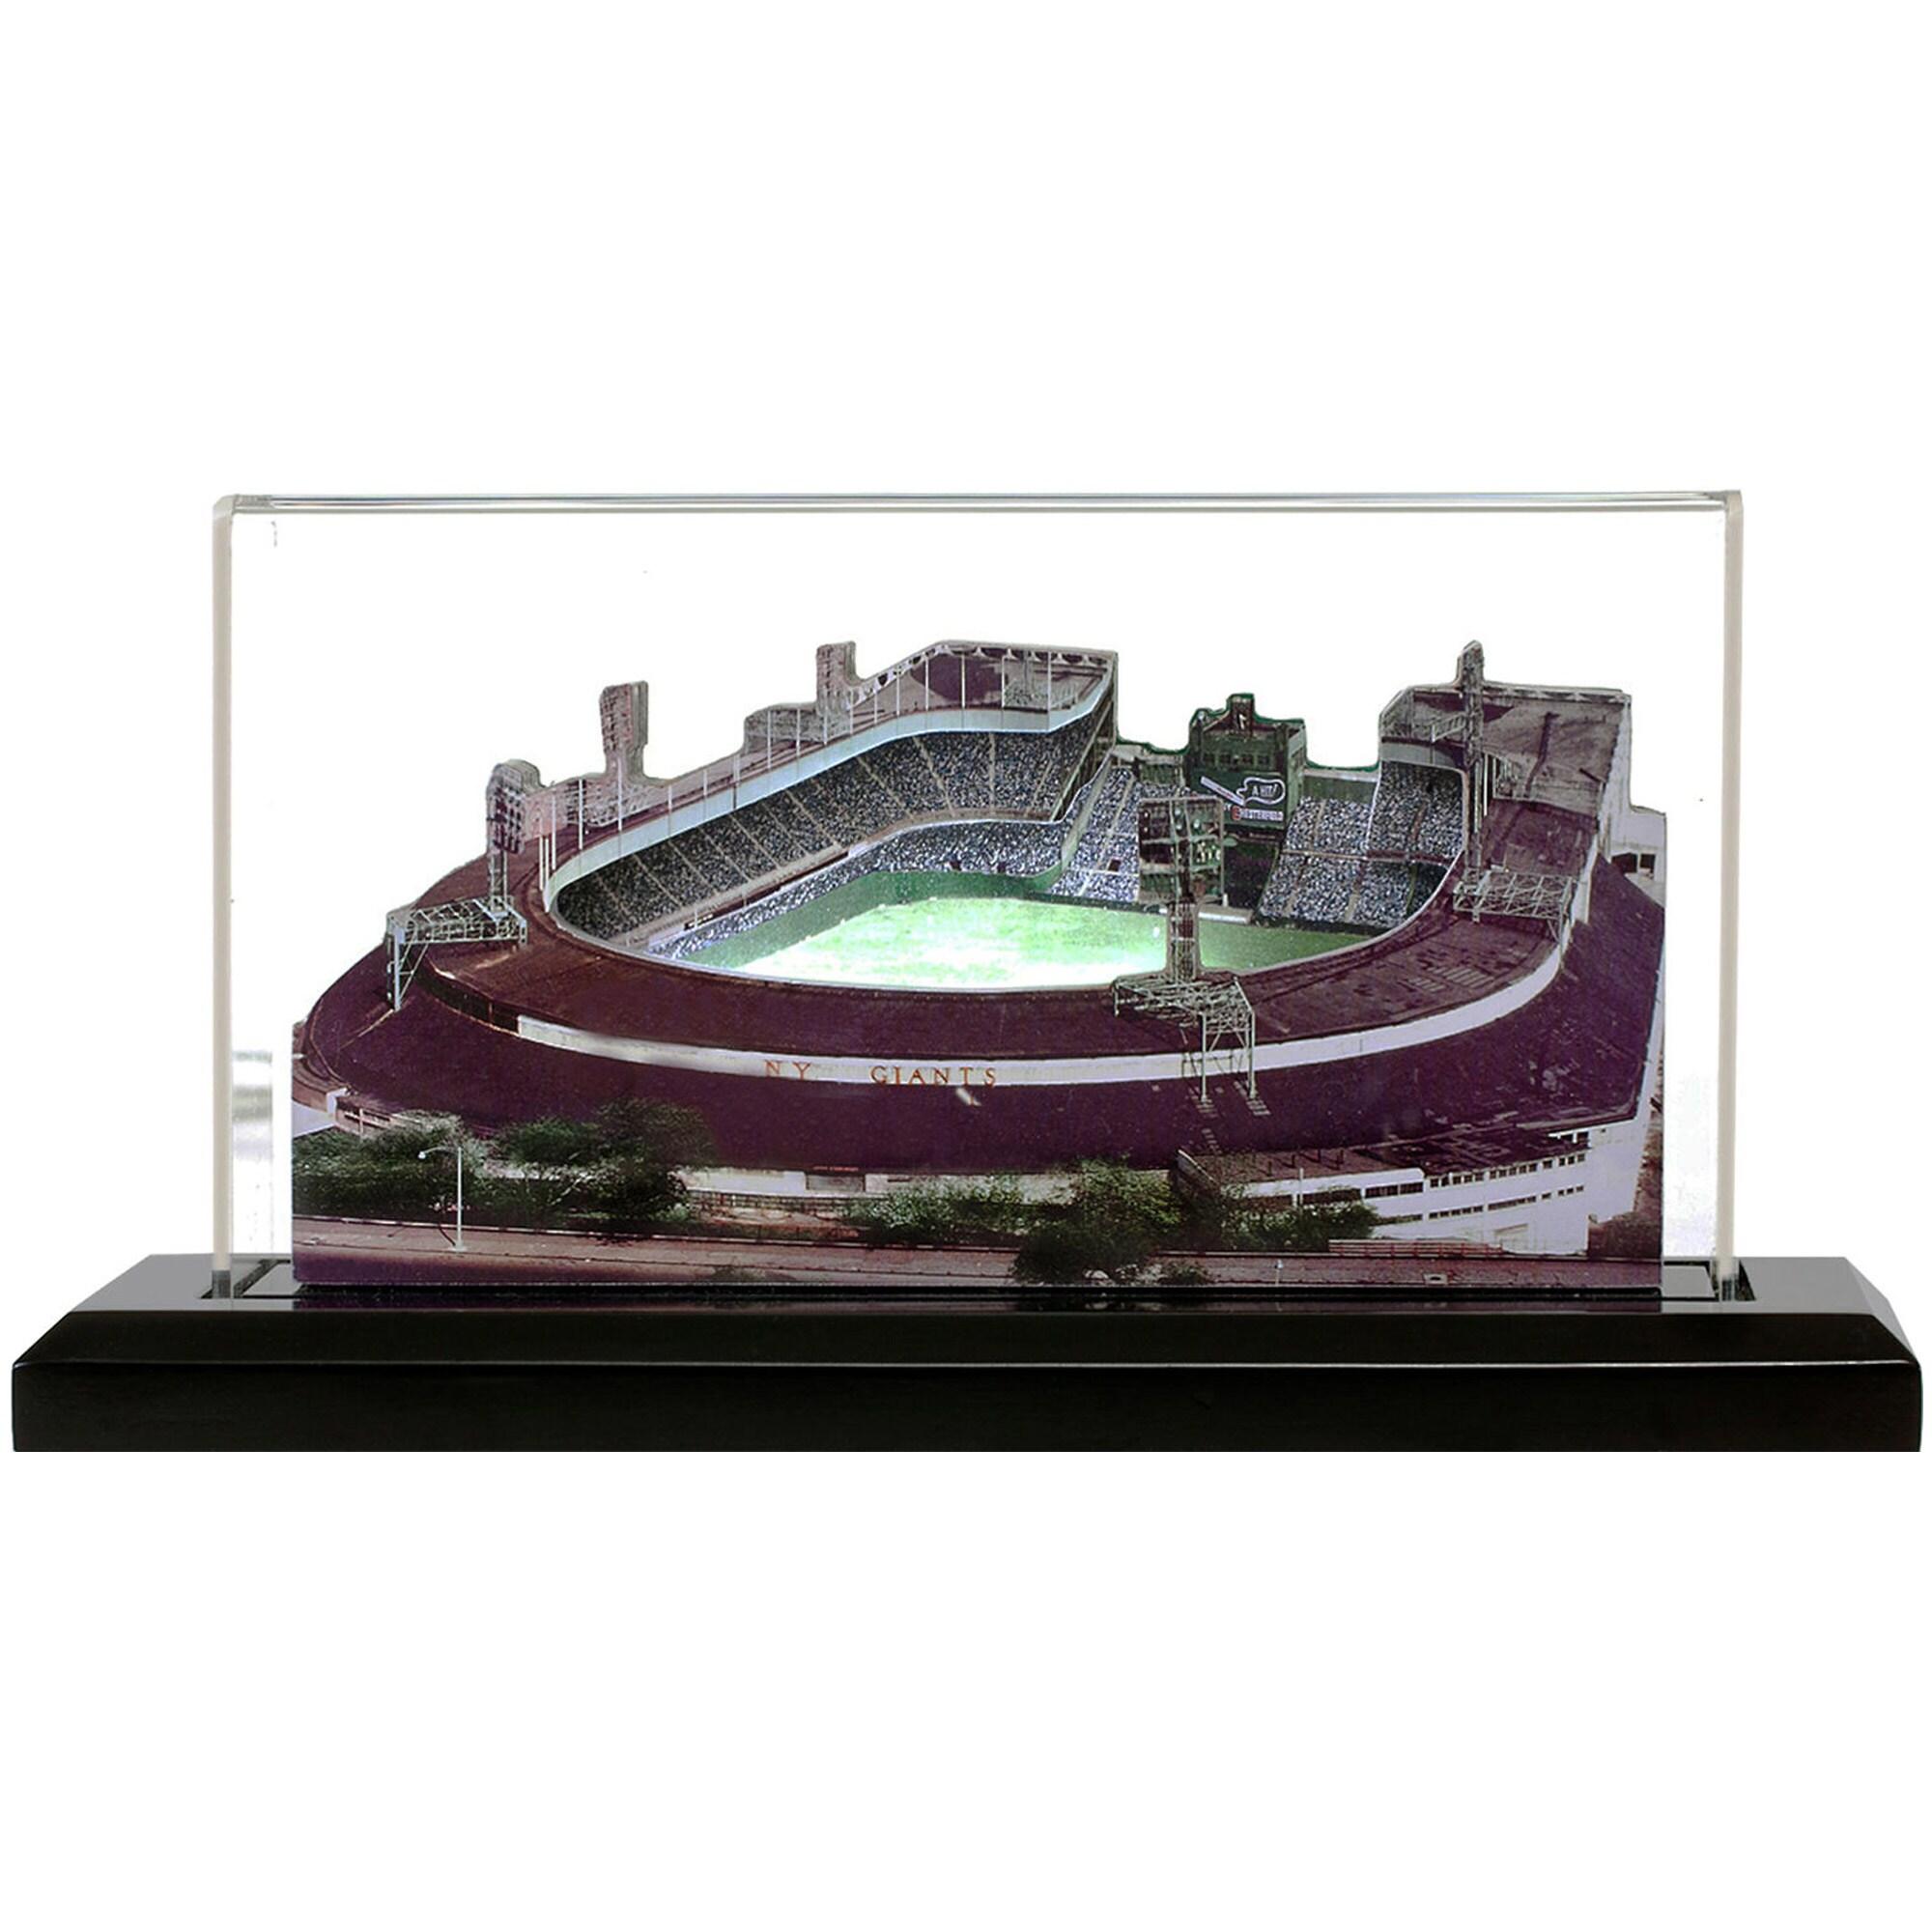 "New York Giants 13"" x 6"" Polo Grounds Light Up Replica Ballpark"